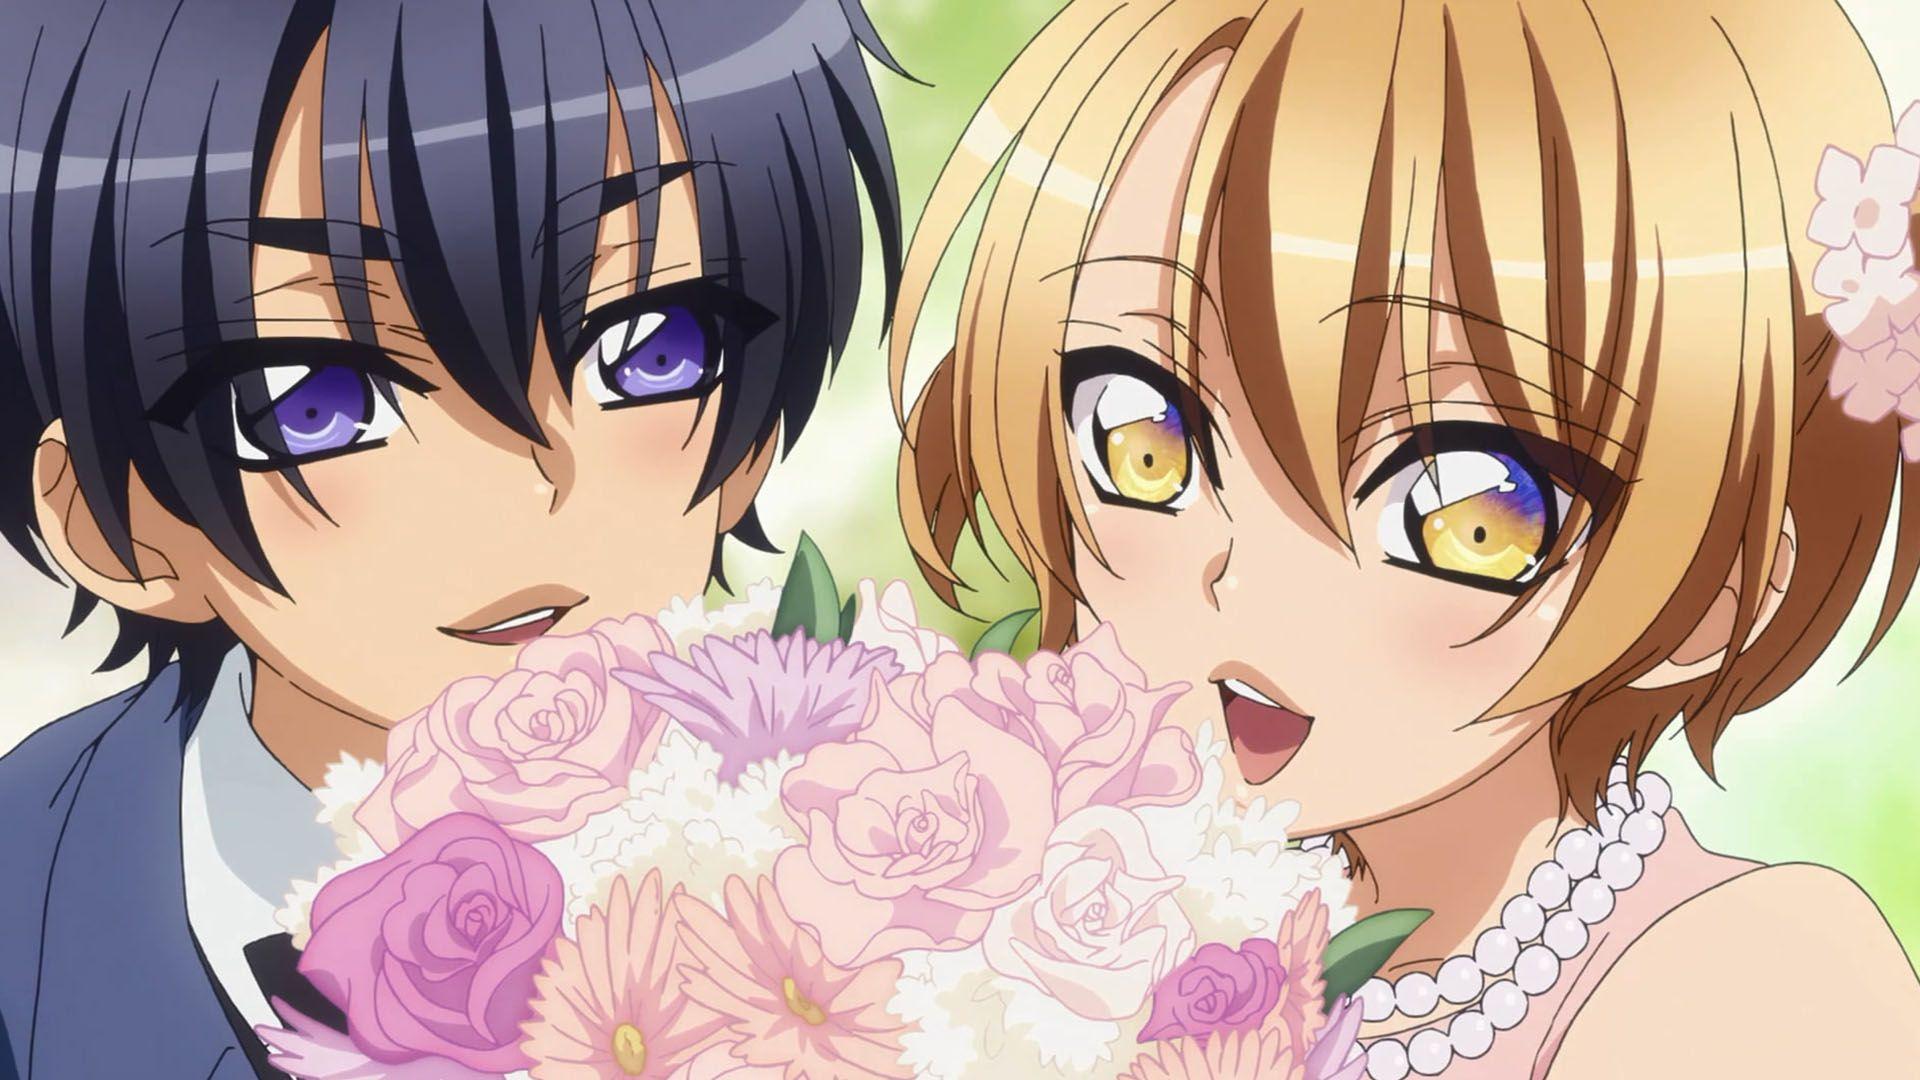 Рисунки аниме любовная сцена